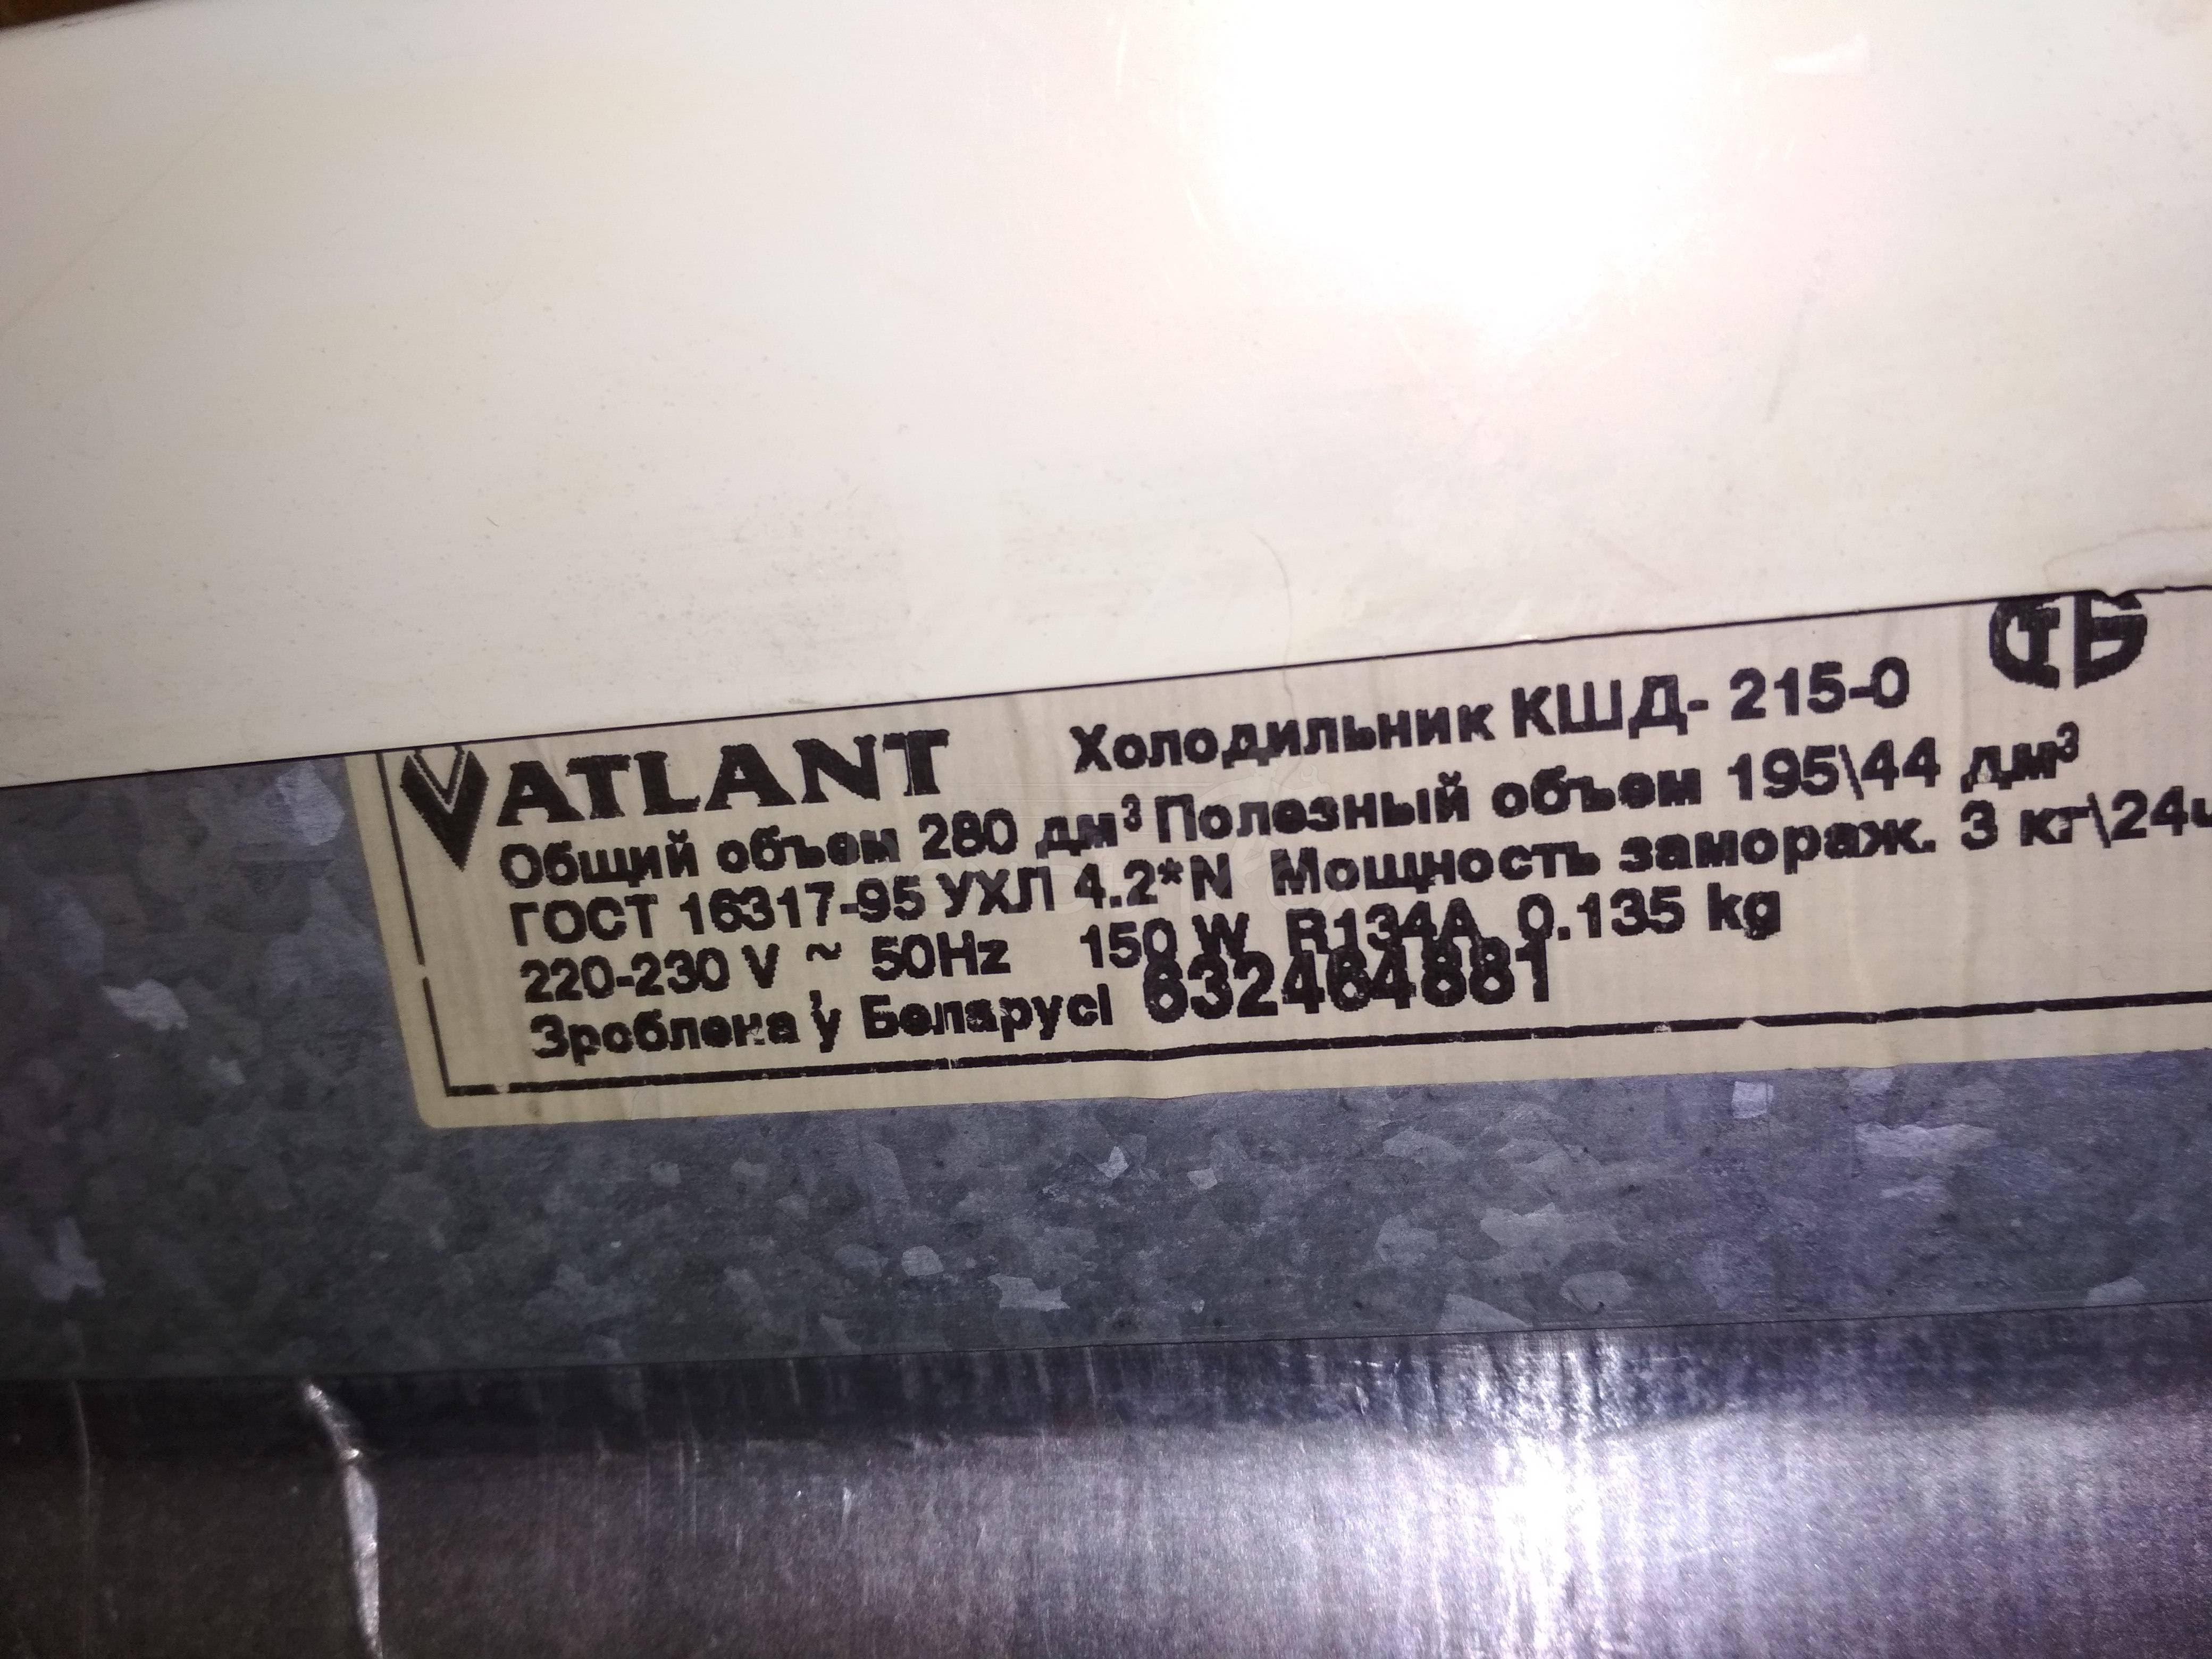 Схема холодильника атлант кшд-150